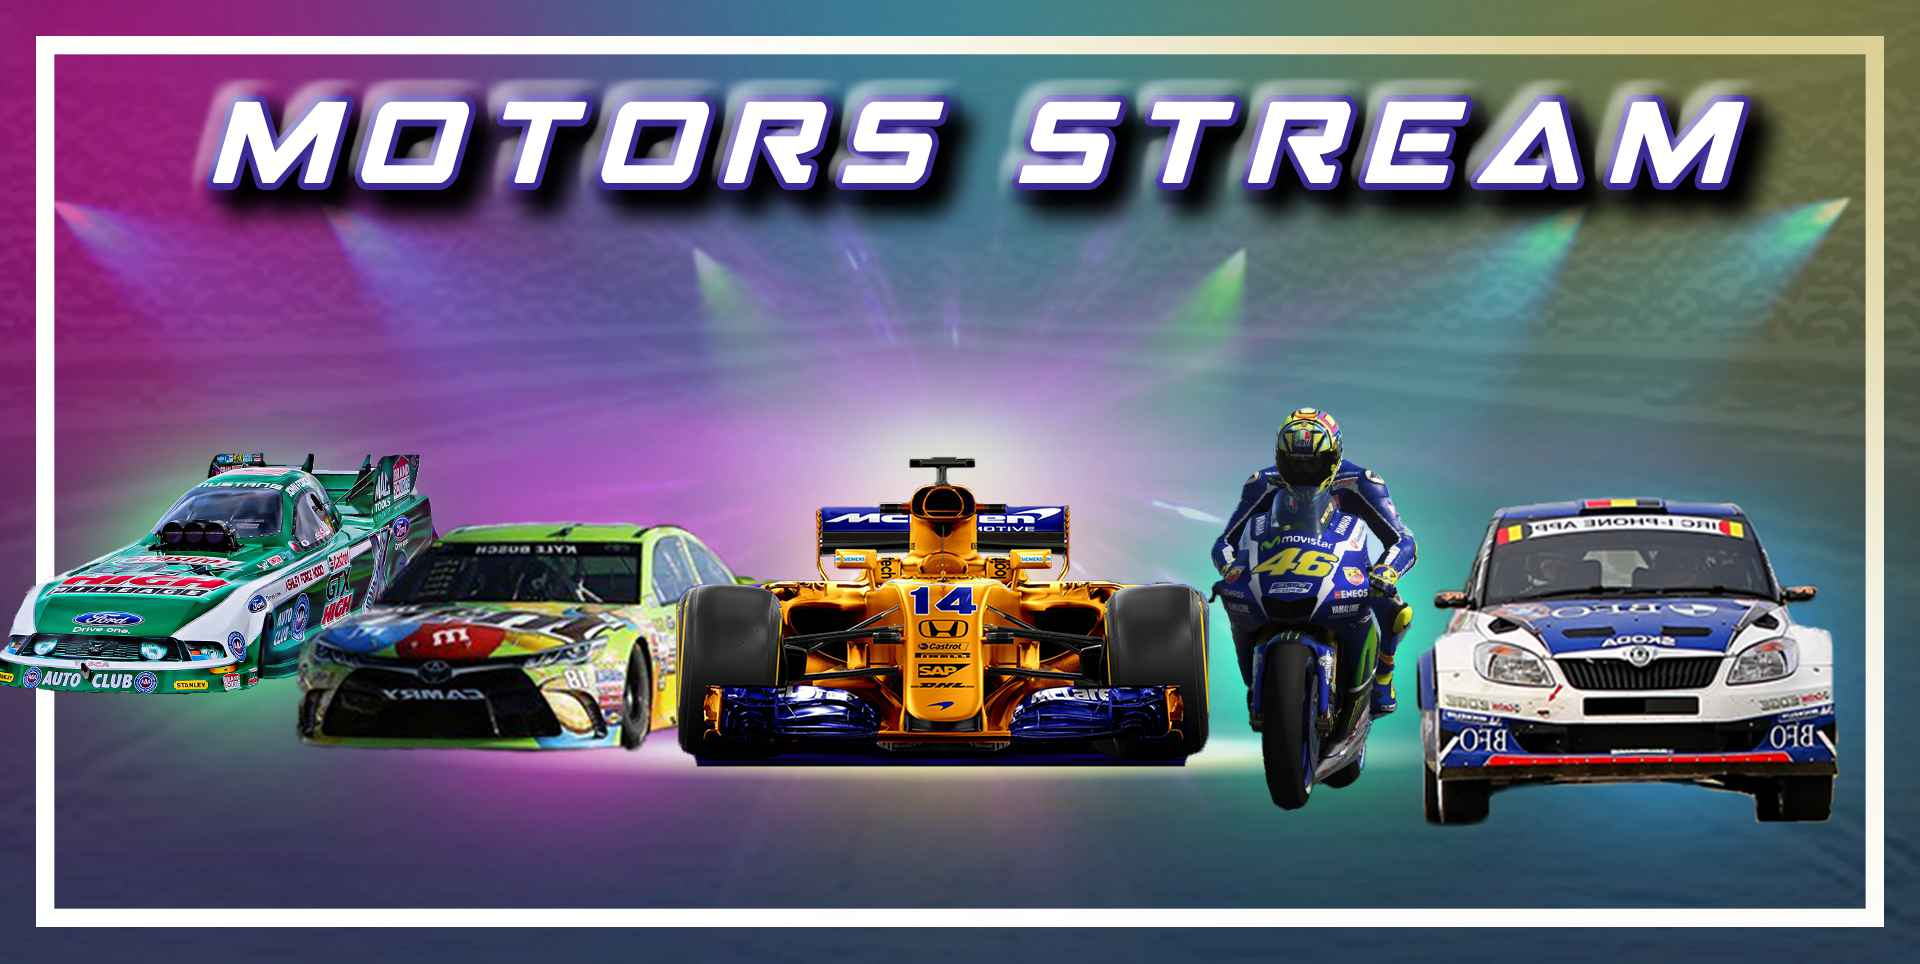 Live Summit Racing Equipment NHRA Nationals Streaming